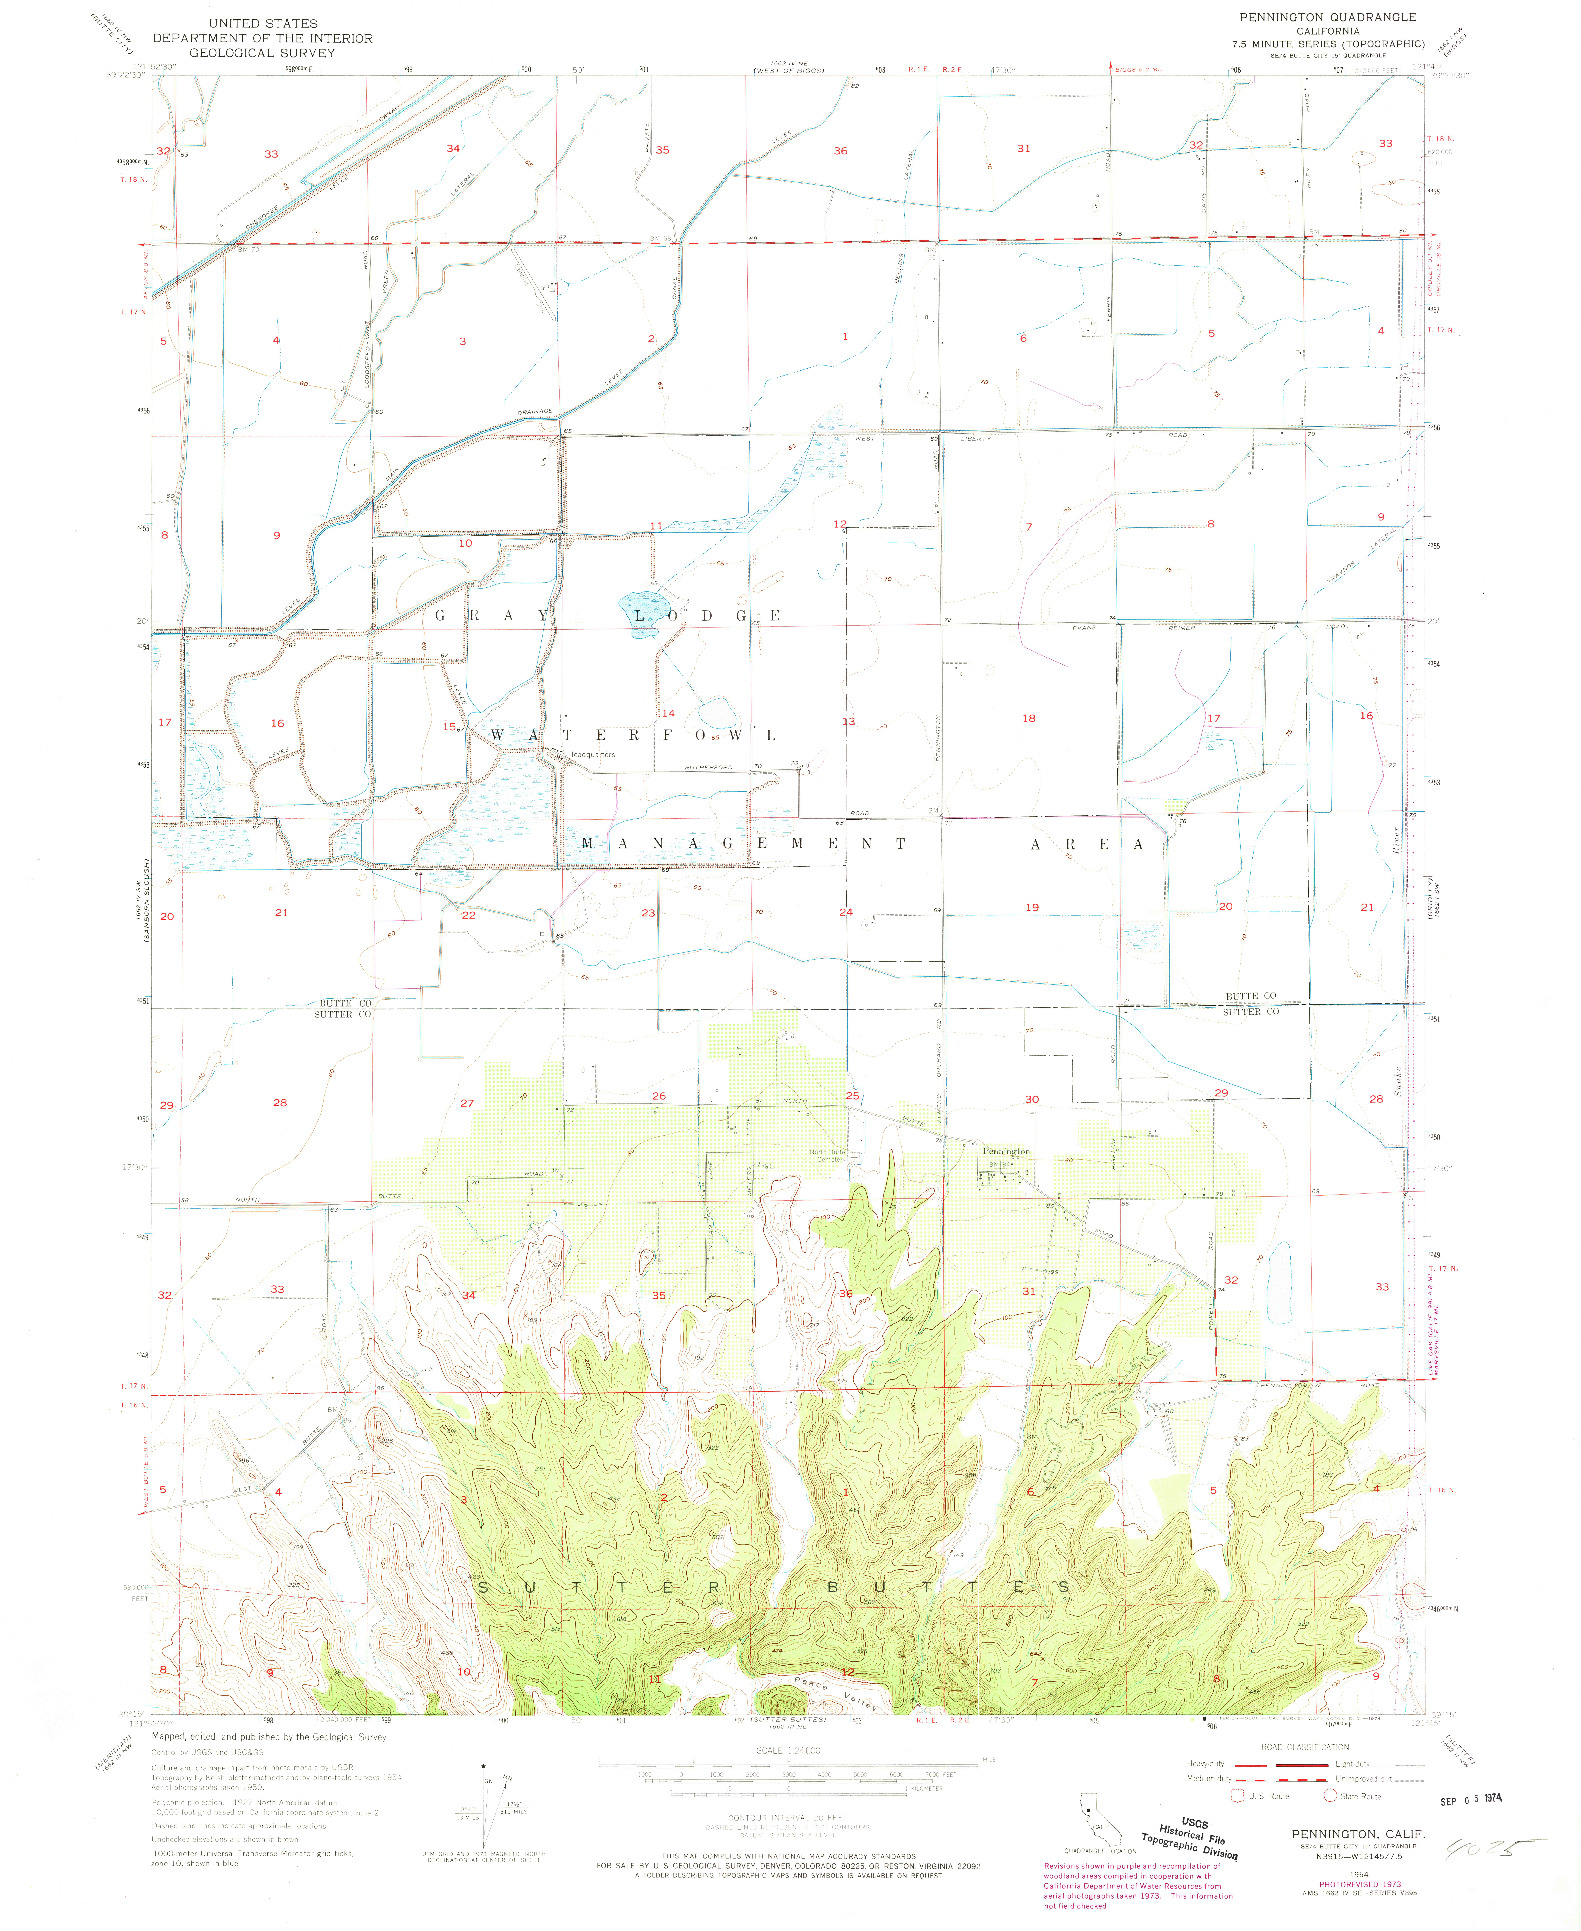 USGS 1:24000-SCALE QUADRANGLE FOR PENNINGTON, CA 1954